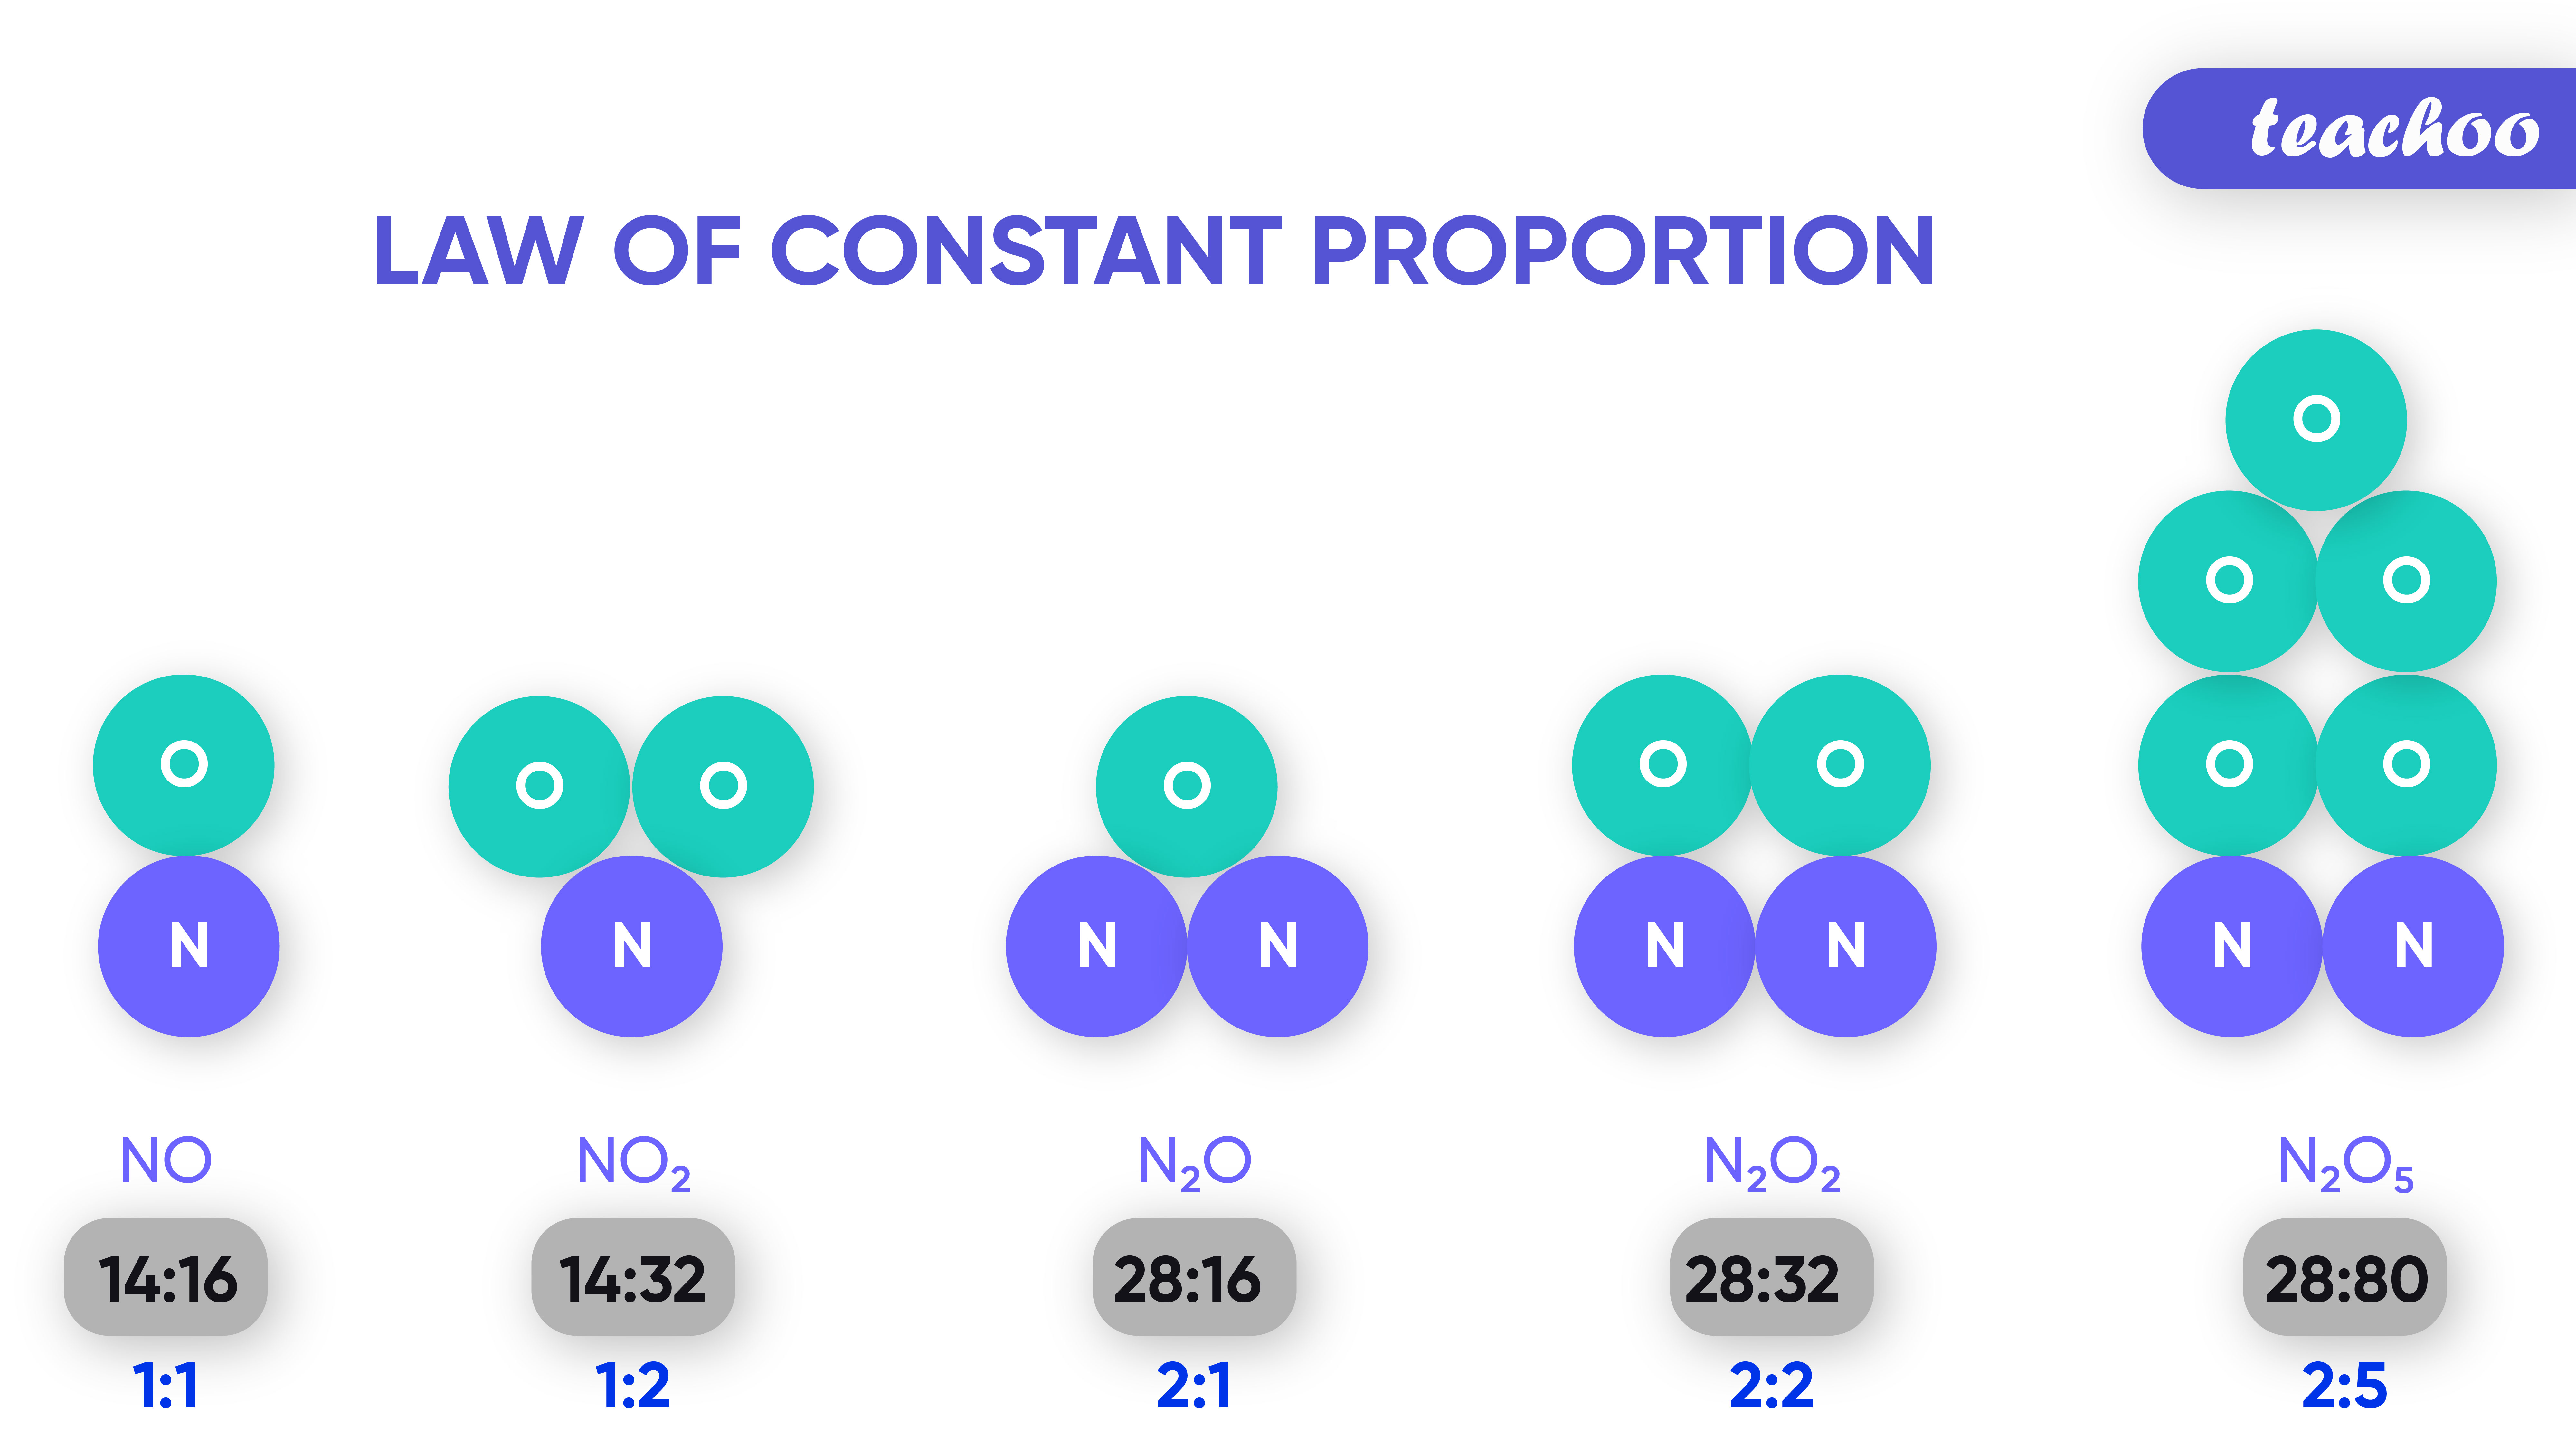 Law of constant proportion-Teachoo-01.jpg